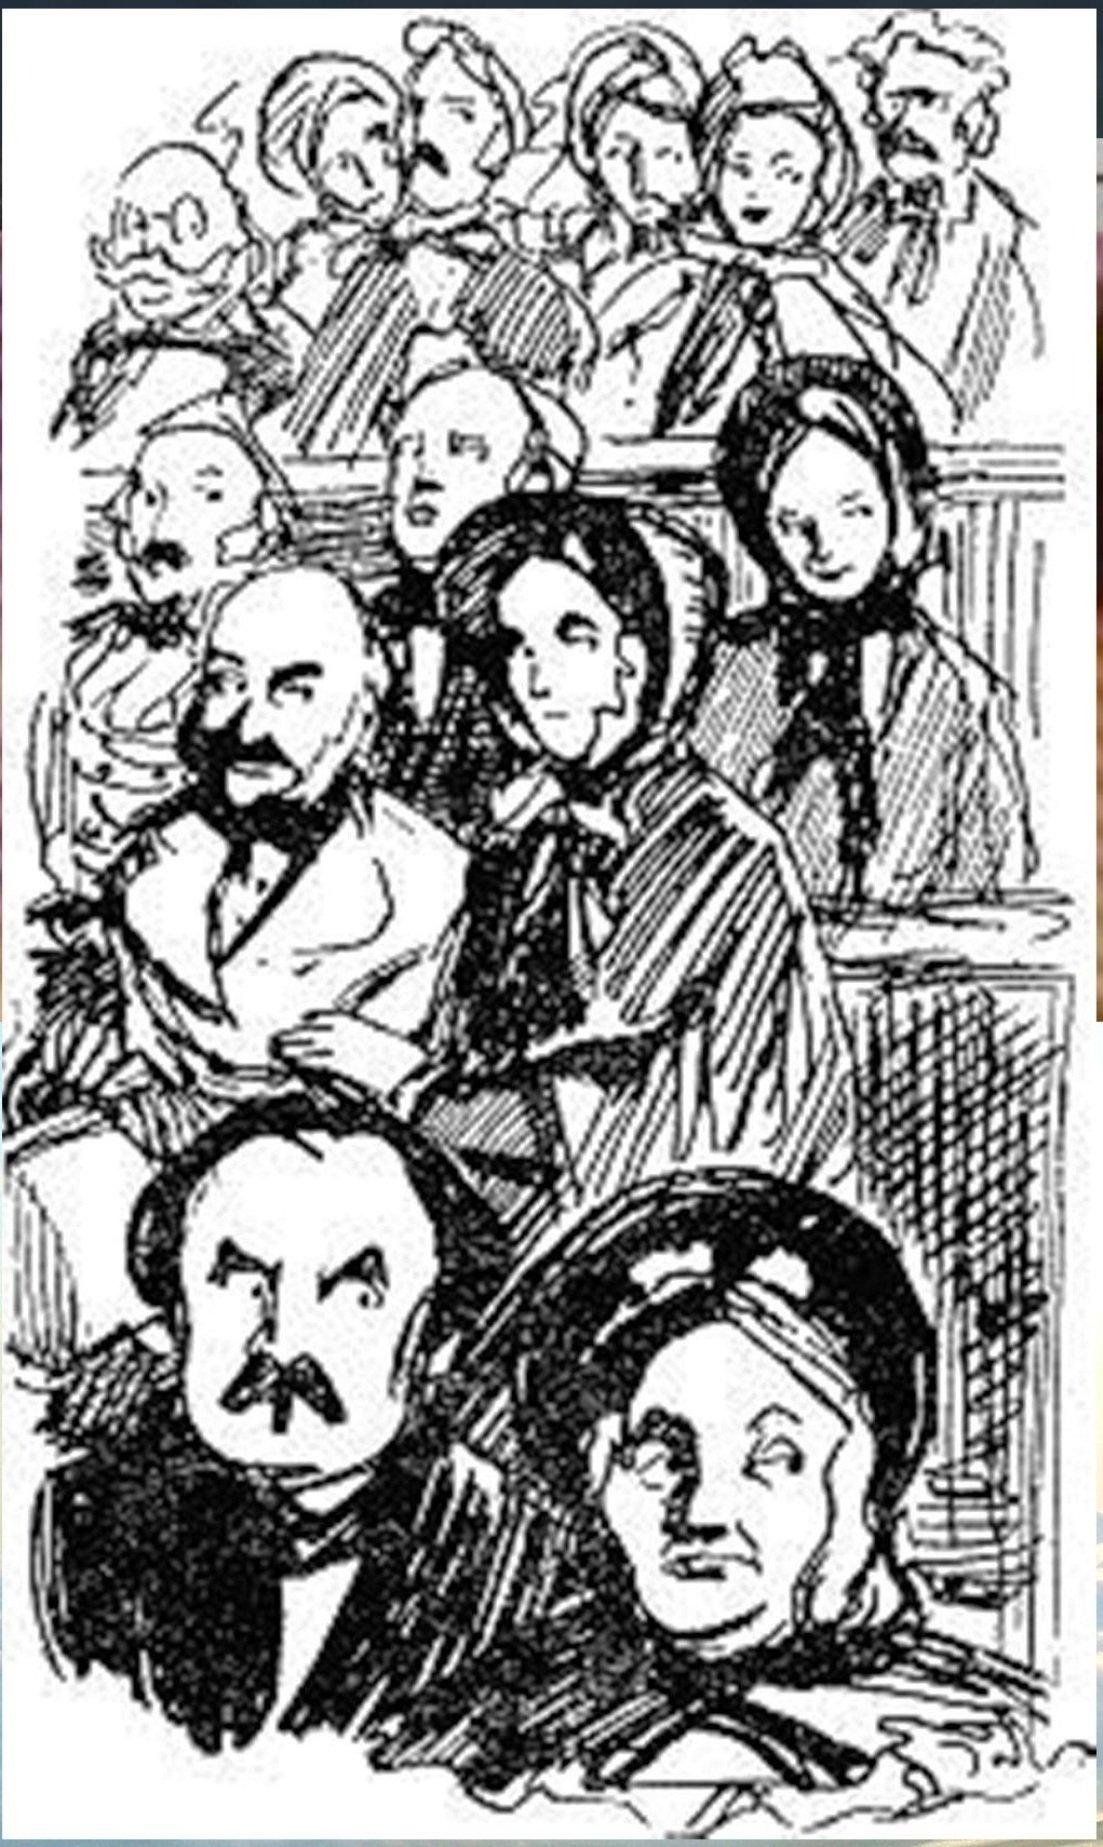 Иллюстрация В. Н. Горяева к пр-ю М.Твена Приключения Тома Сойера (13).